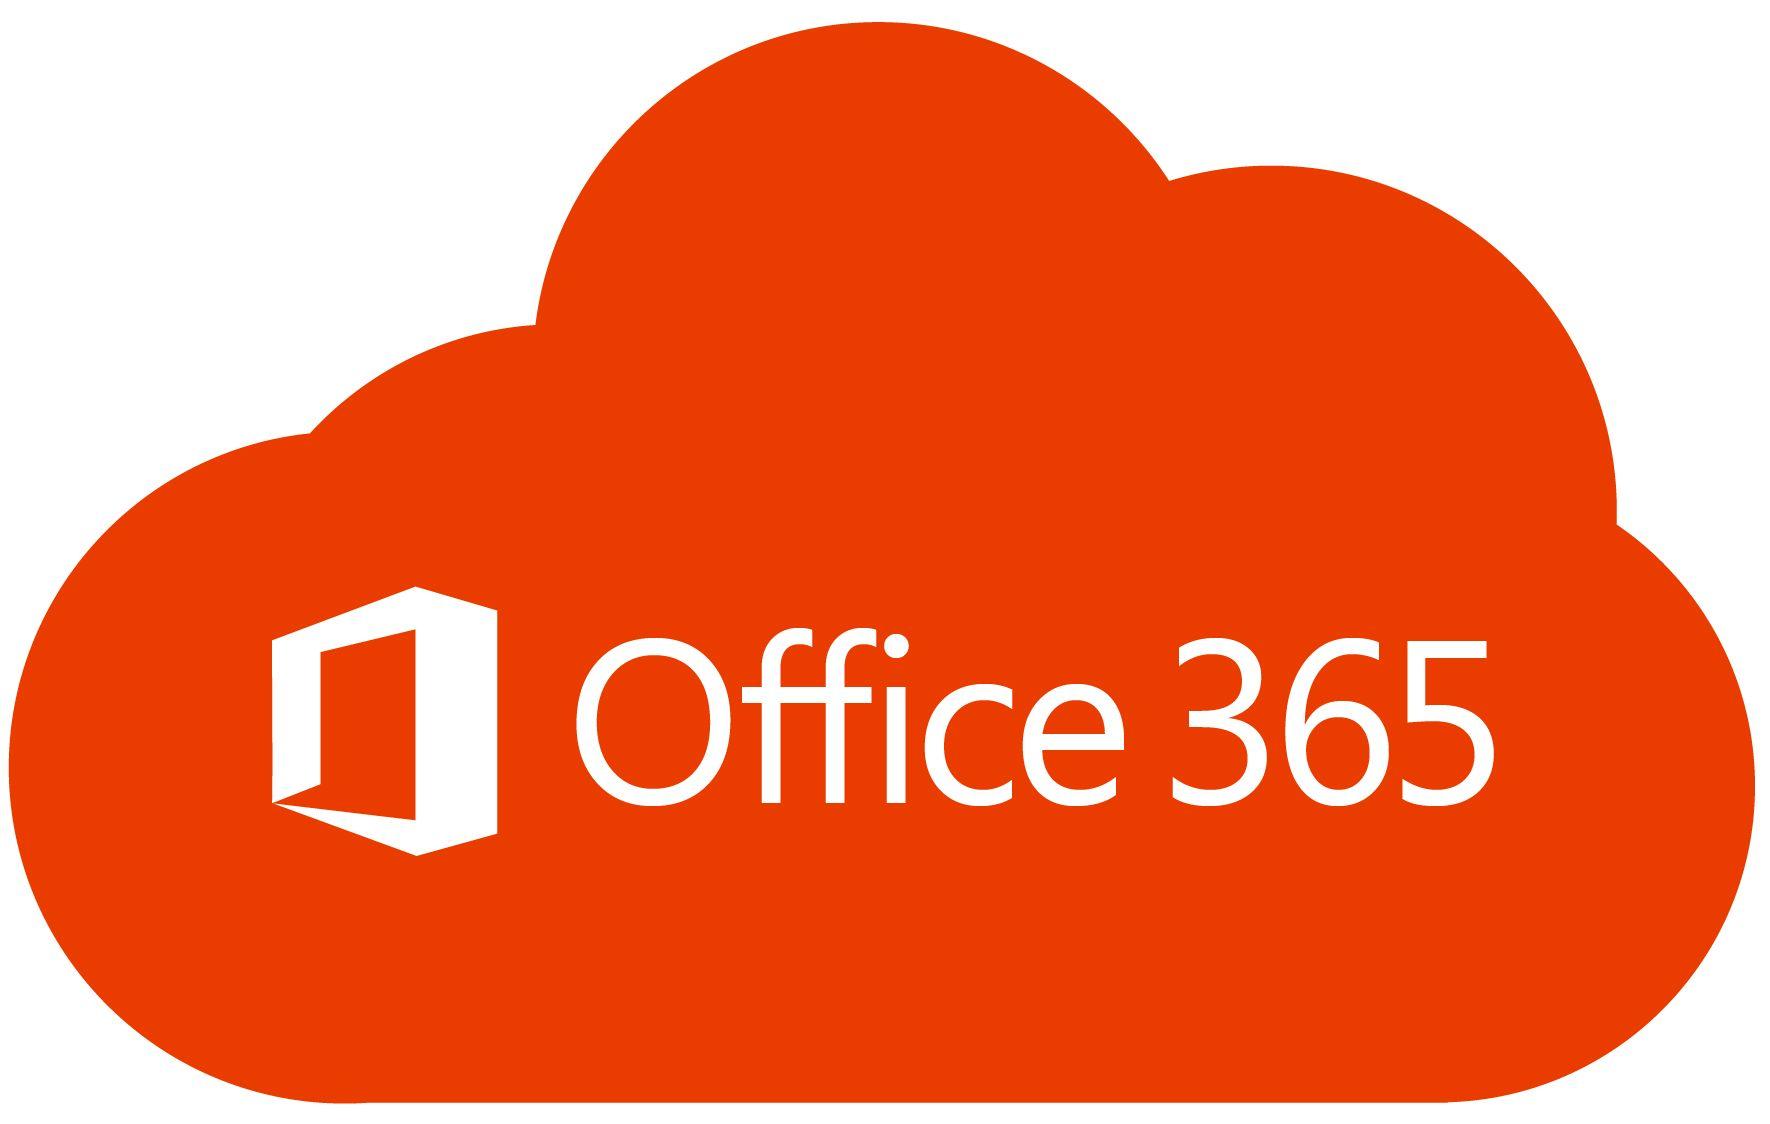 office-365_MFI_Corse